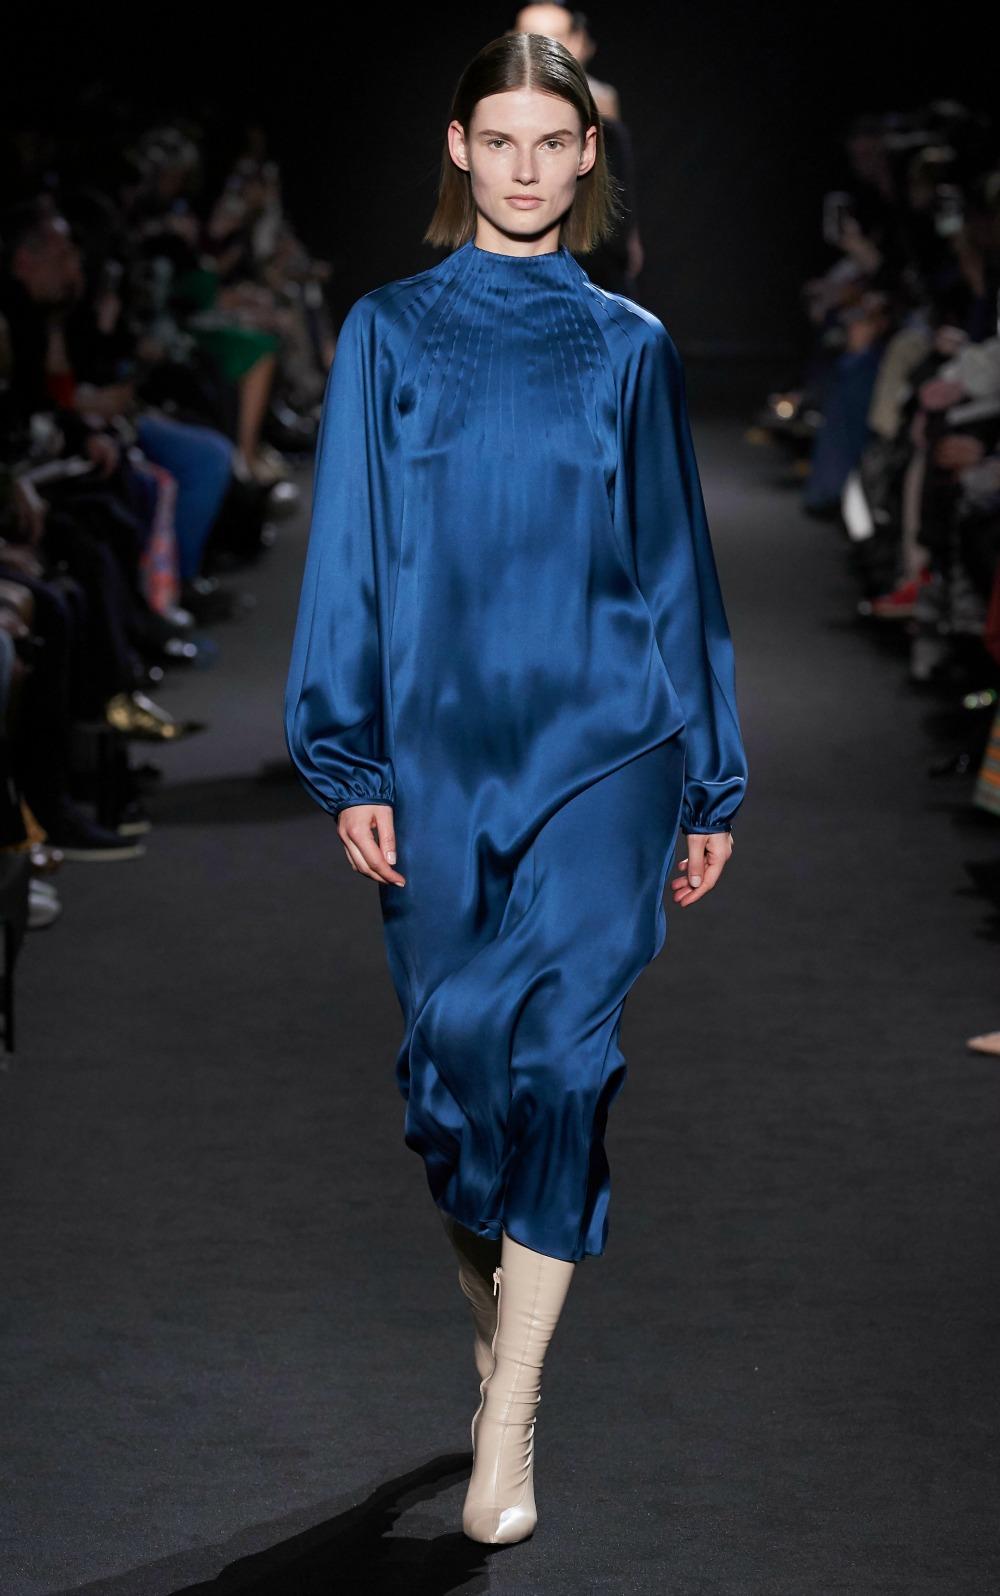 2019 Fall Fashion Trends to Wear Now I Satin Dress on the Rochas AW19 Runway #FallFashion #Runway #Trends #FashionBlog #Styleinspo